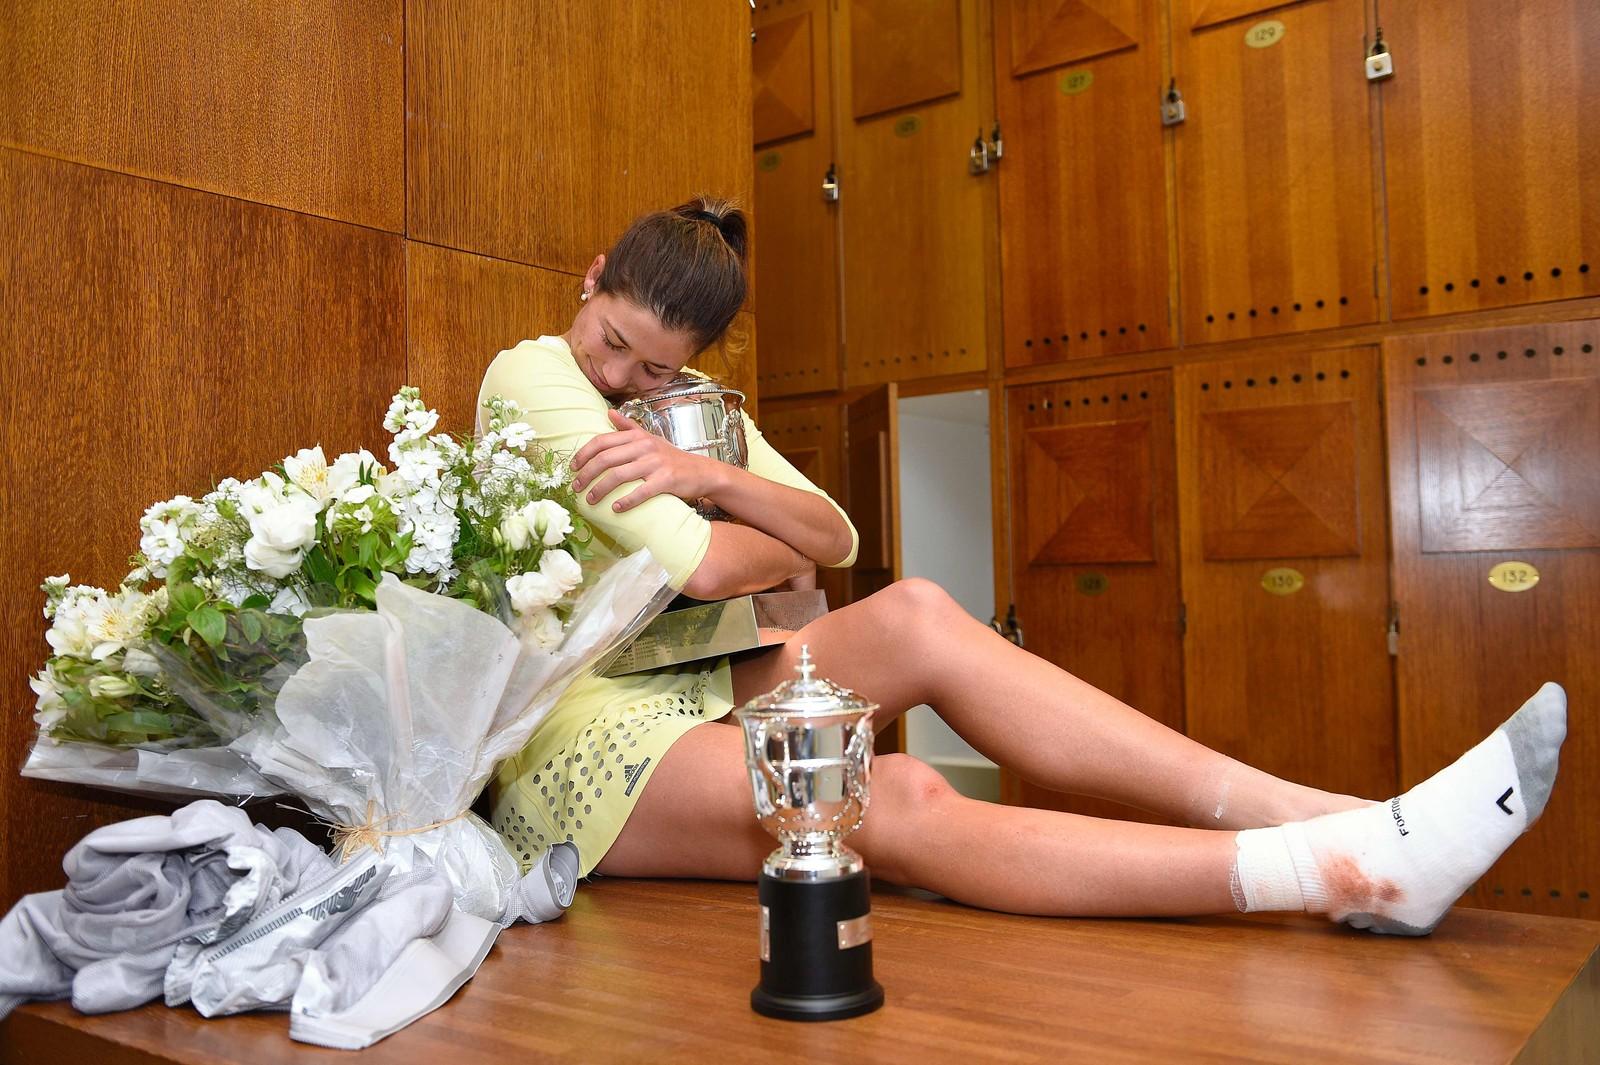 Spanske Garbine Muguruza i garderoben med pokalen etter seieren i tennisturneringen French Open. Hun slo amerikanske Serena Williams i finalen.